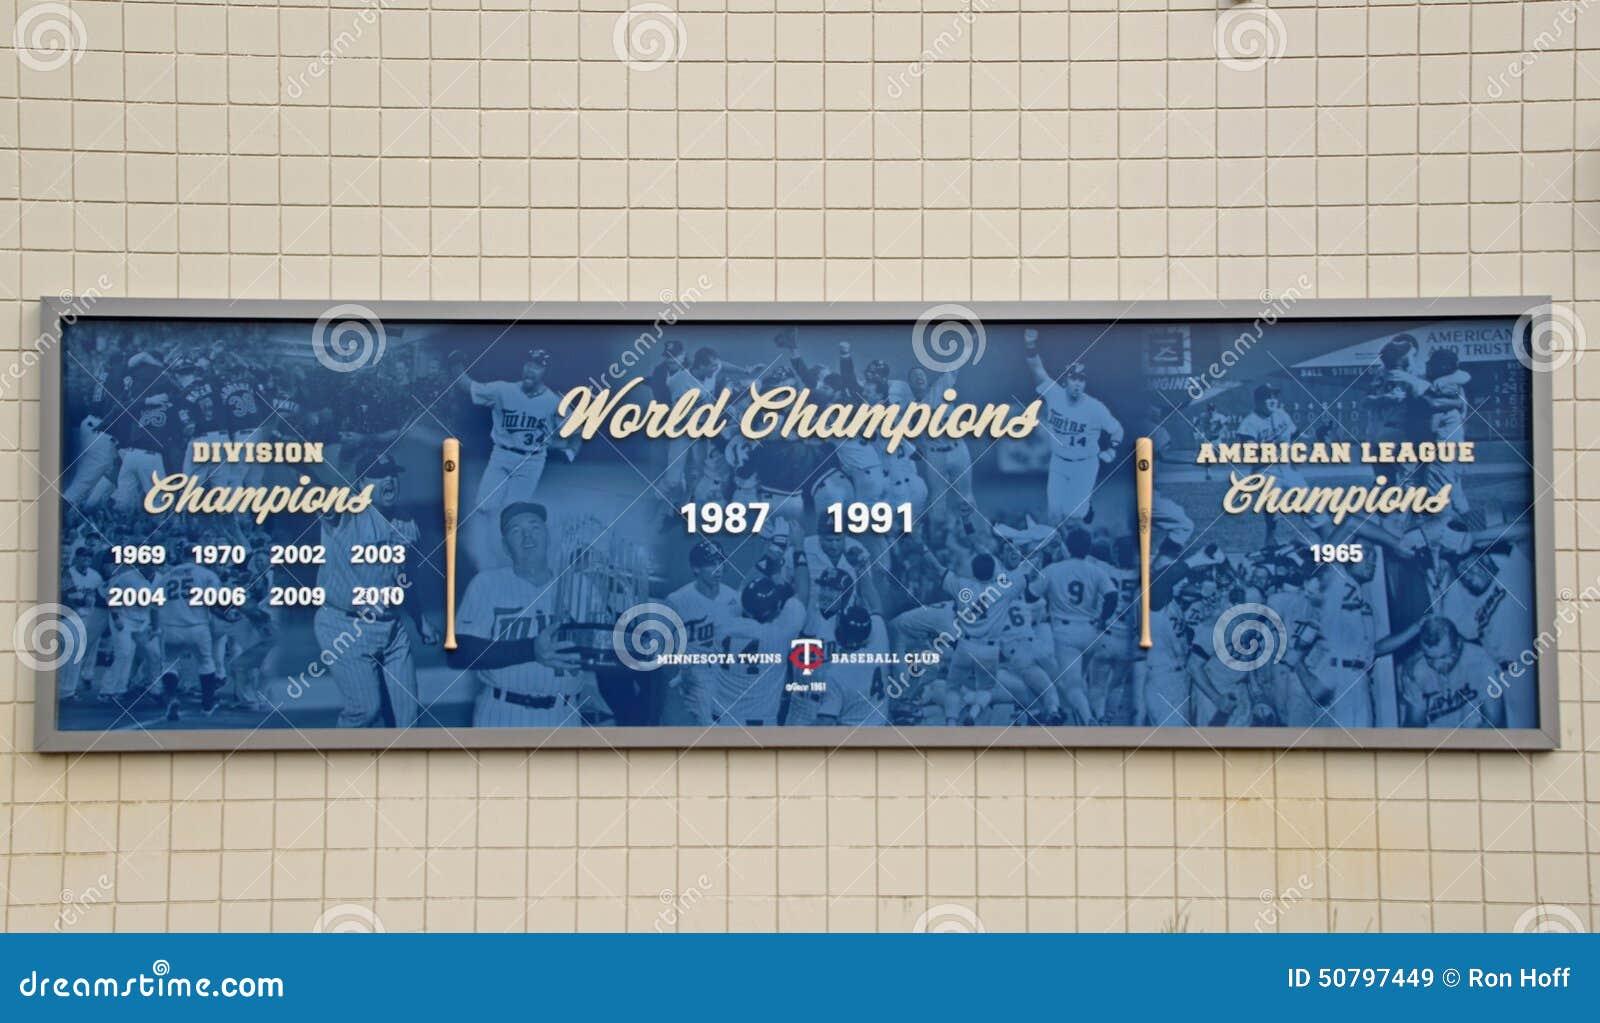 Achievements of the Minnesota Twins